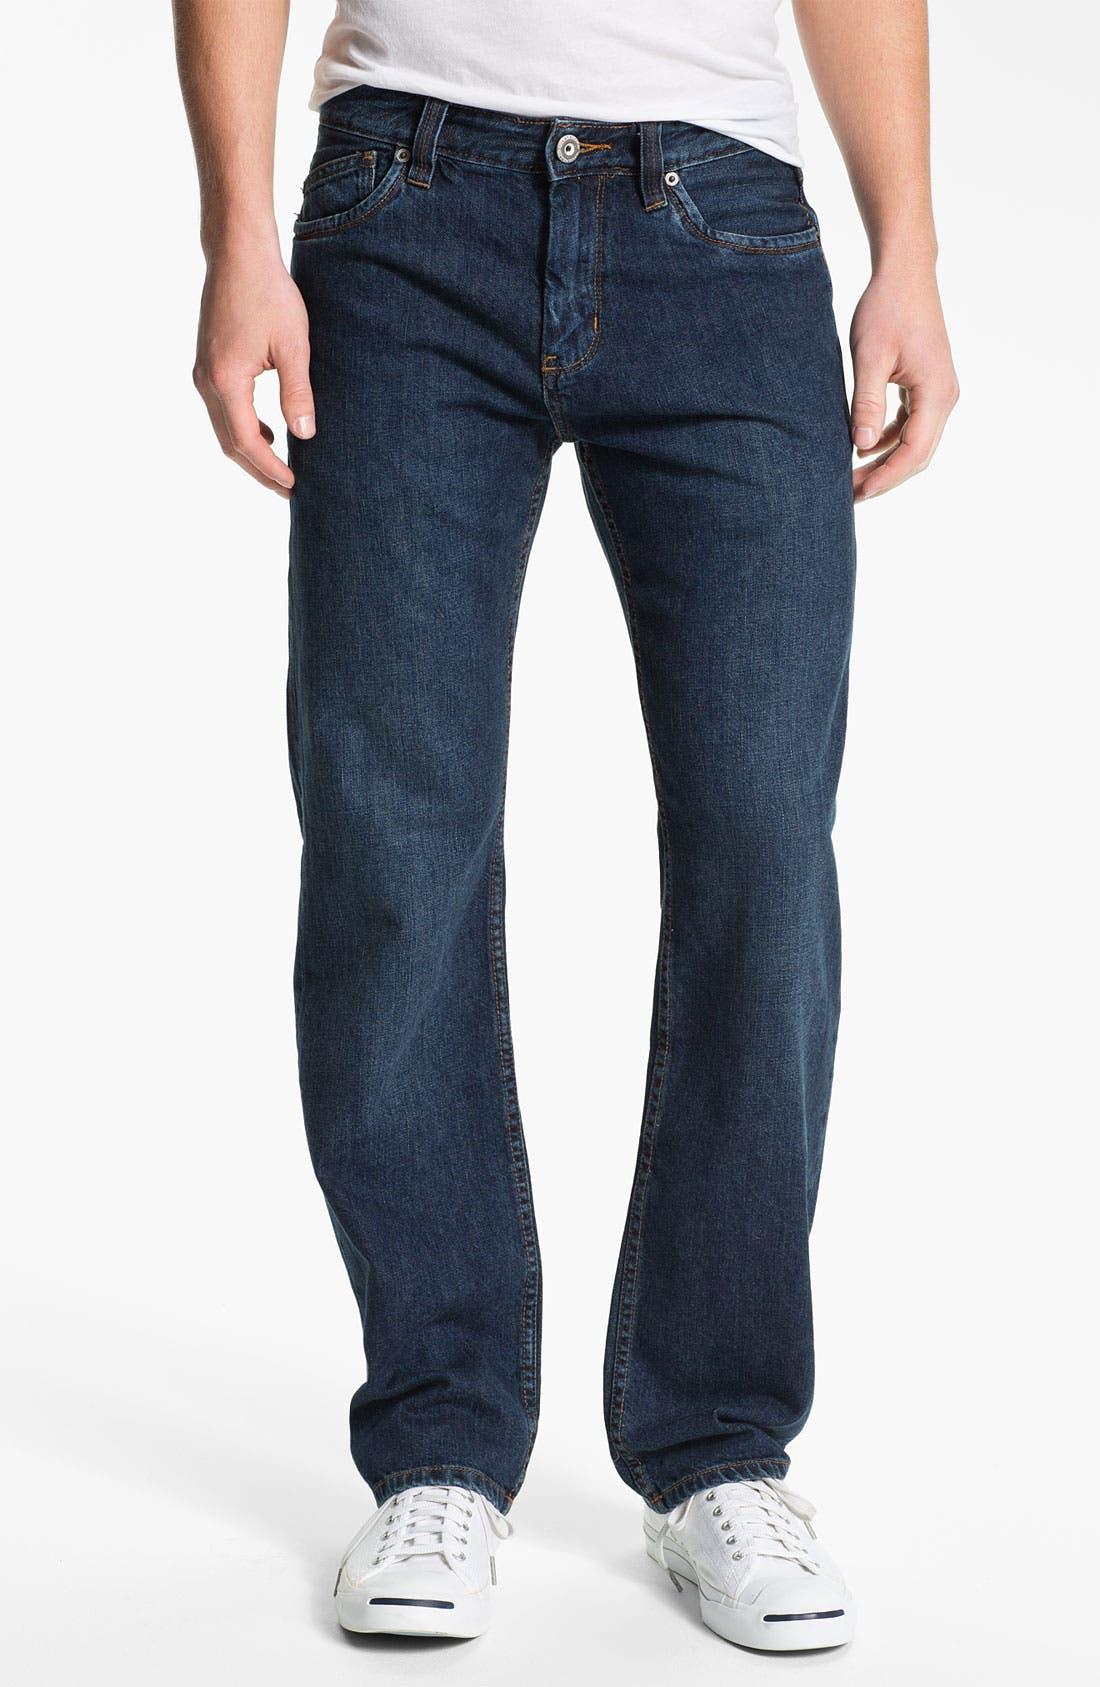 Main Image - Tommy Bahama Denim 'Steve Standard Fit' Jeans (Dark)